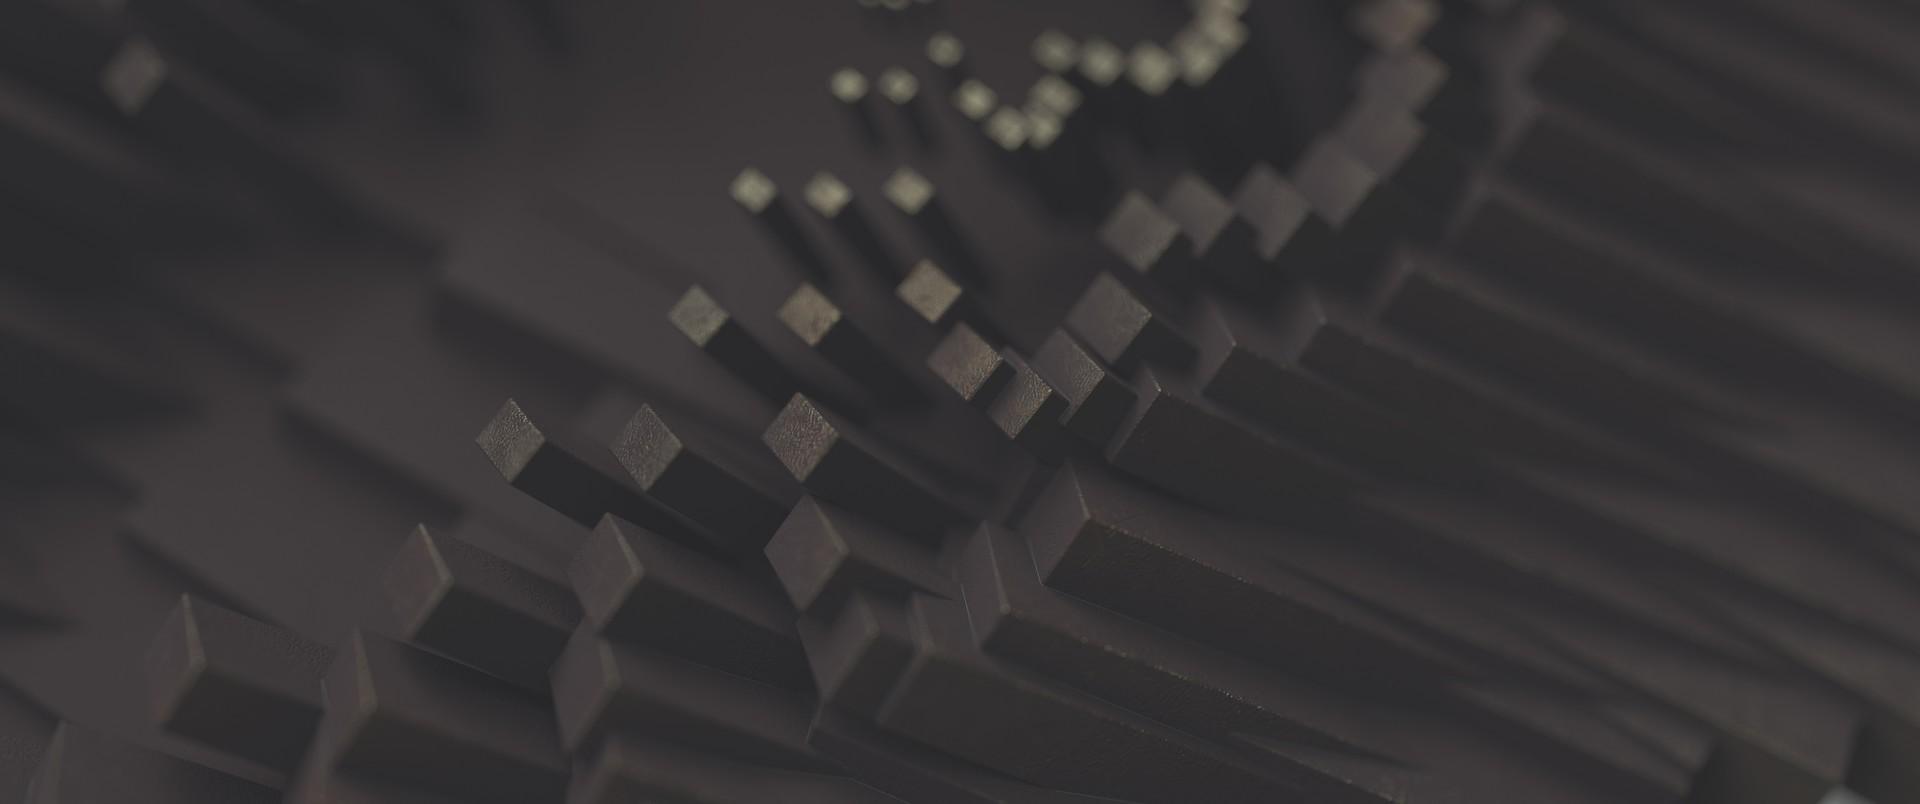 Kresimir jelusic robob3ar 494 abstract box 12 6k